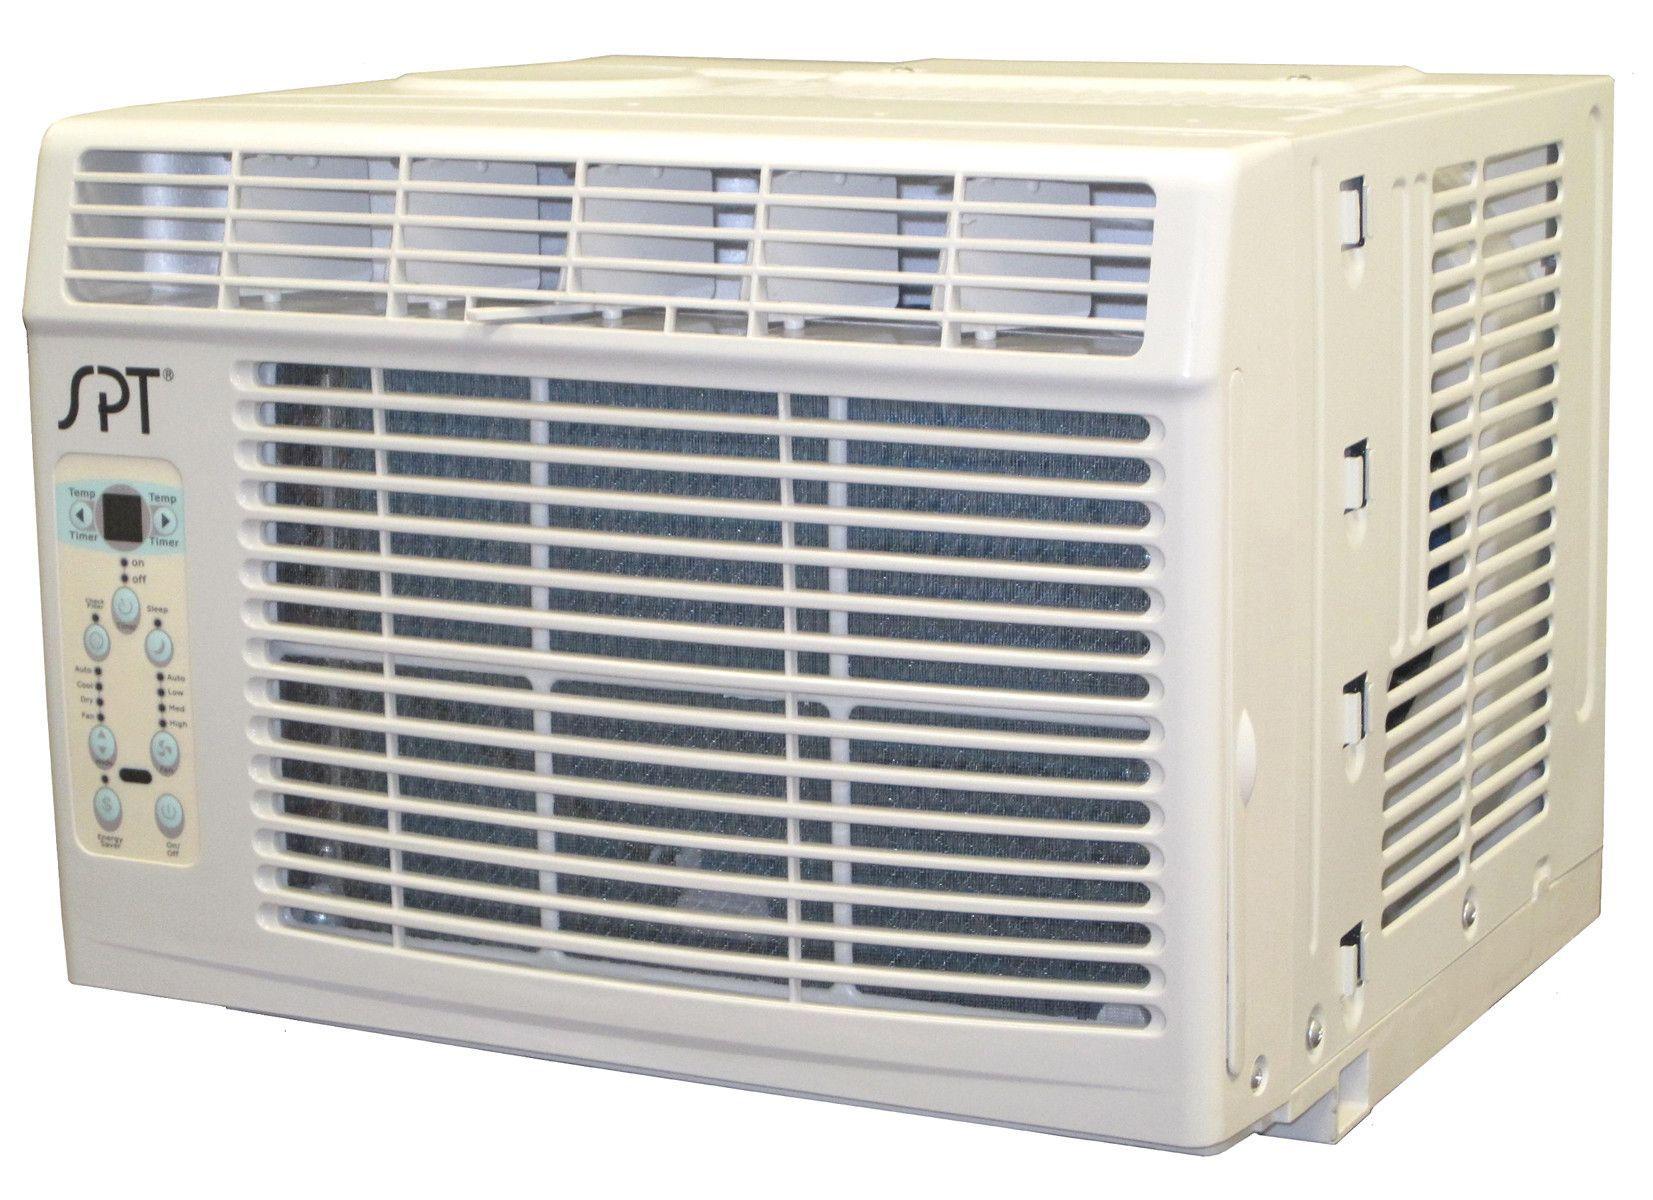 6000 BTU Energy Efficient Window Air Conditioner with Remote